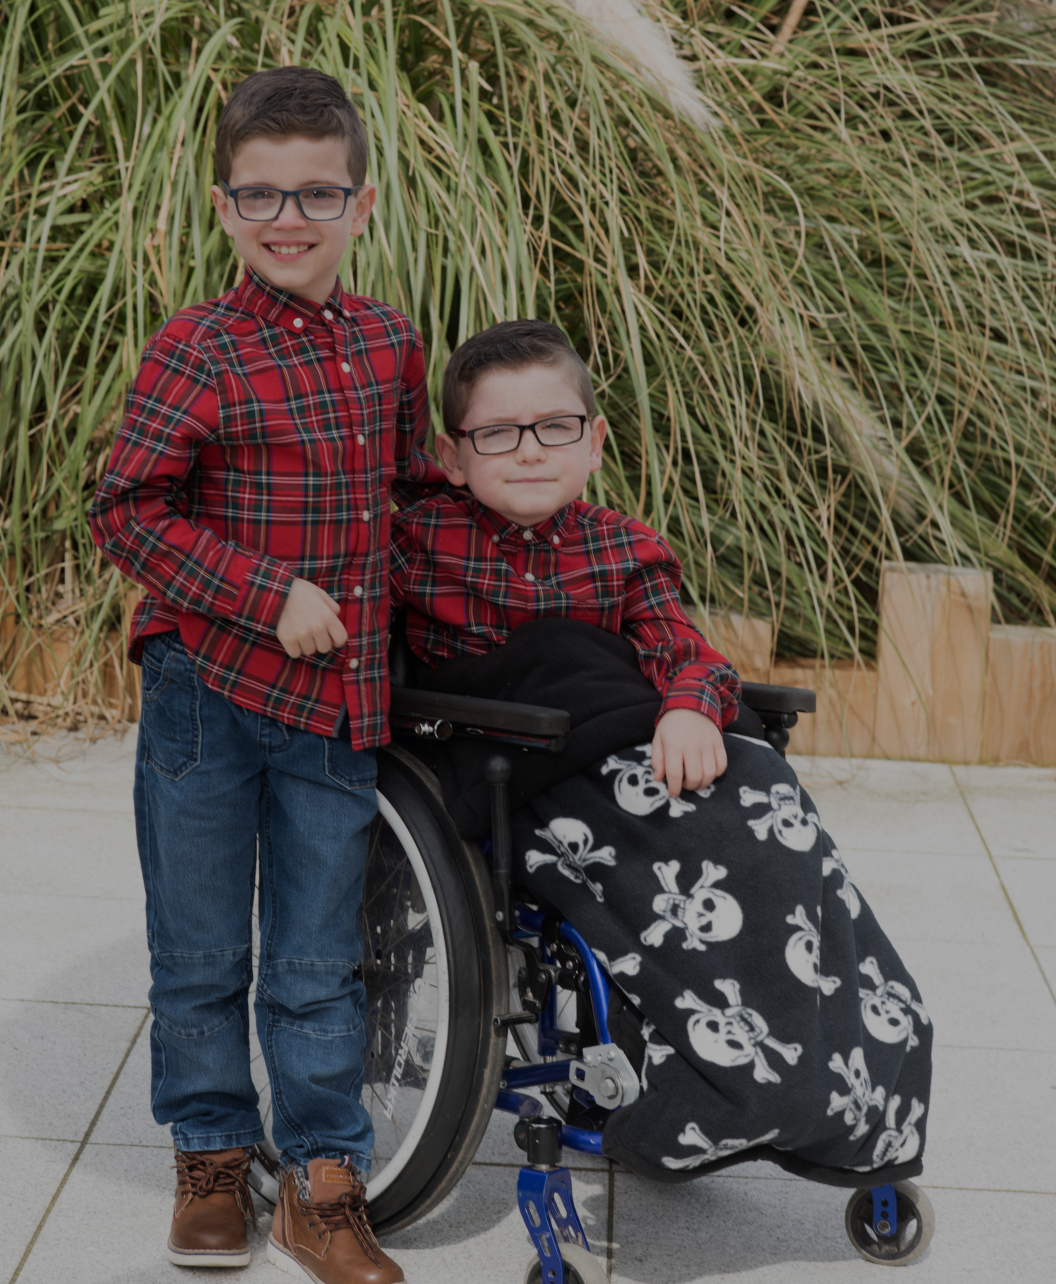 GaryB wheelchair together